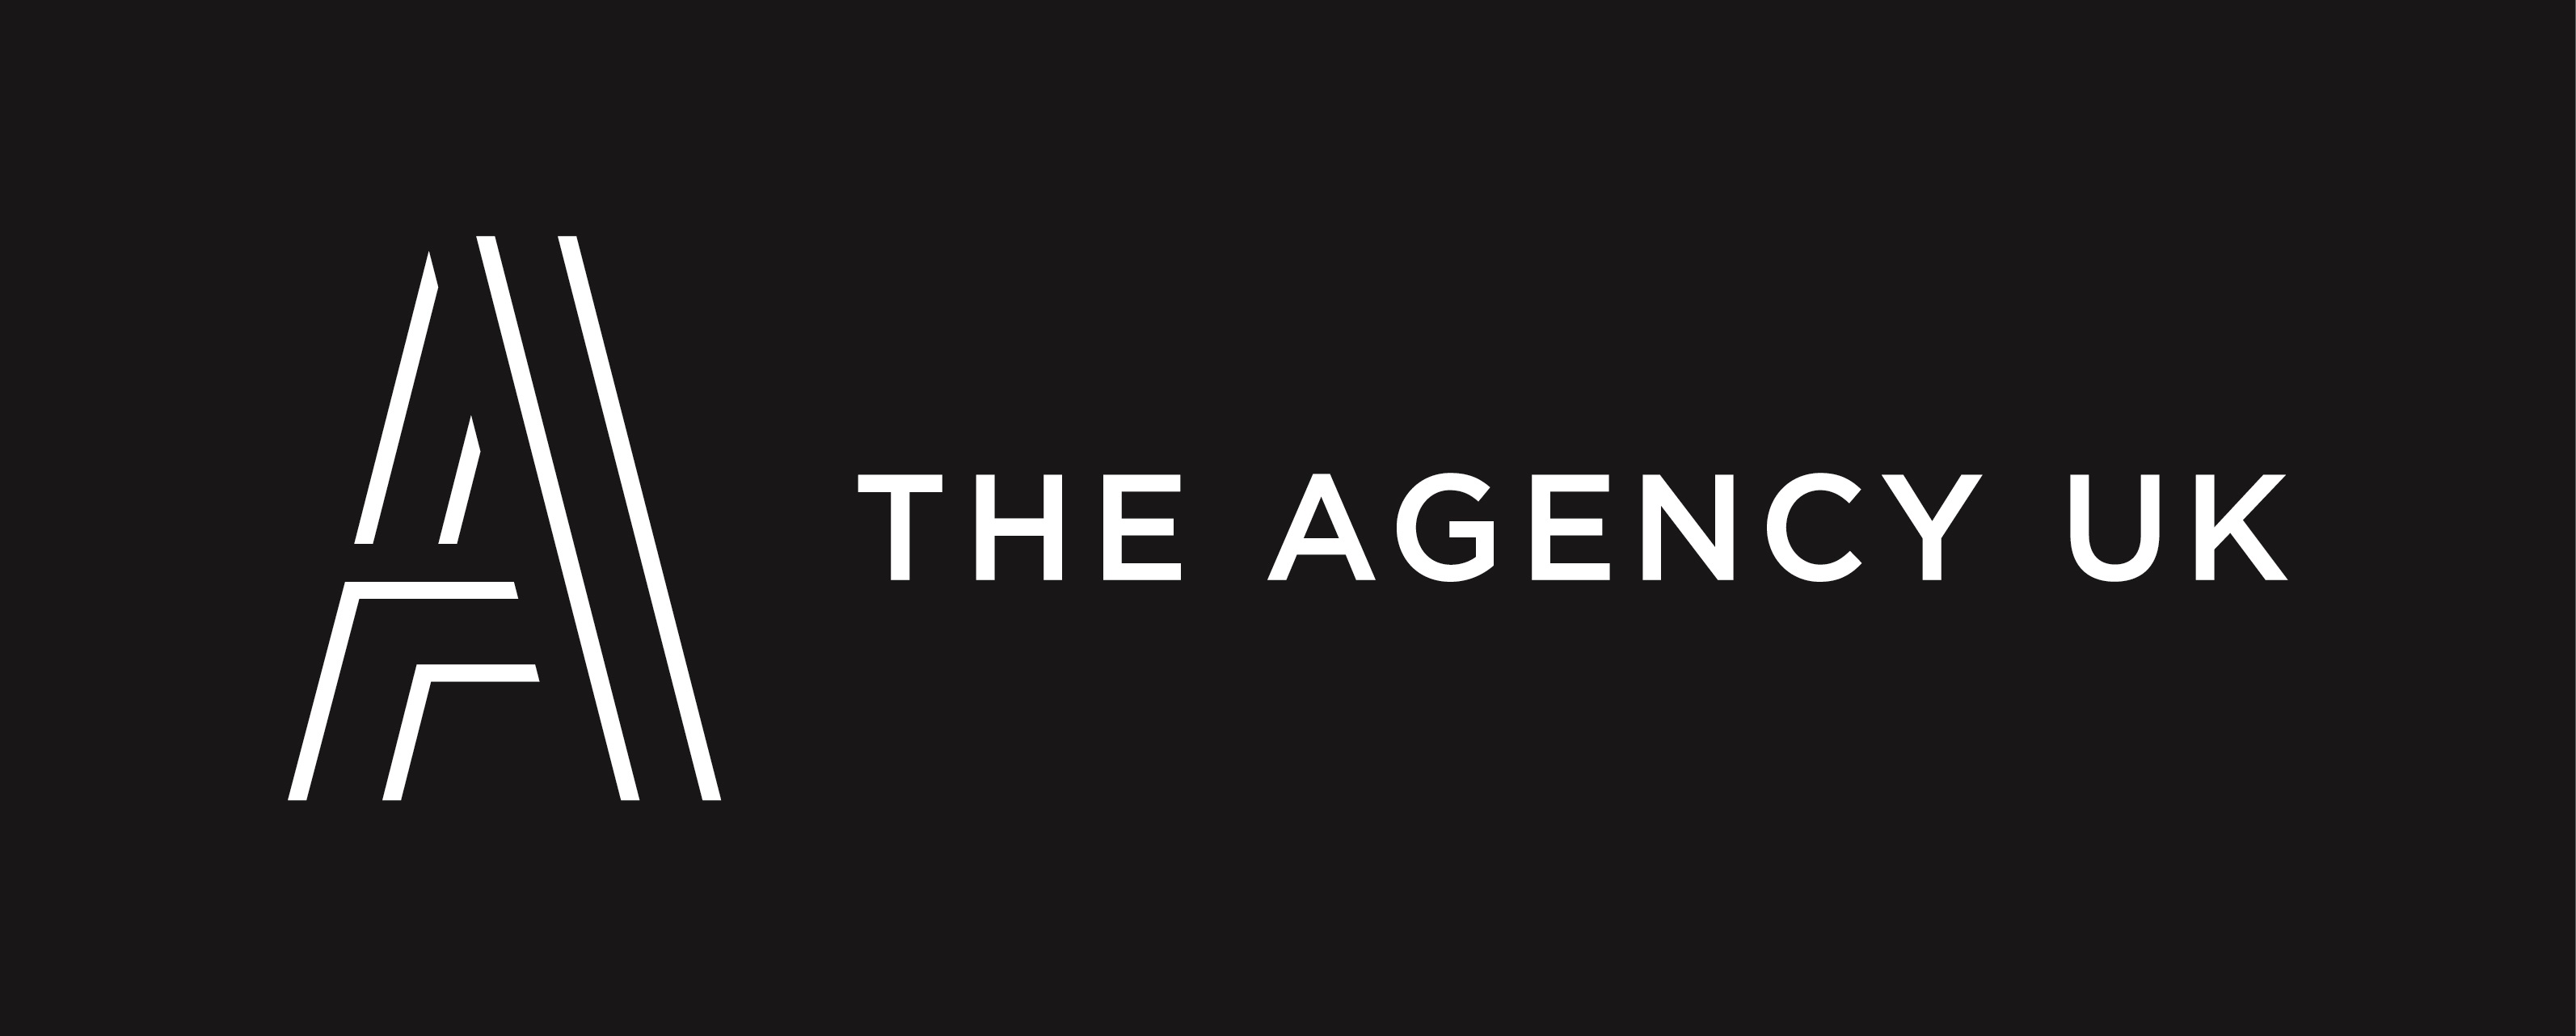 The Agency UK - Redruth